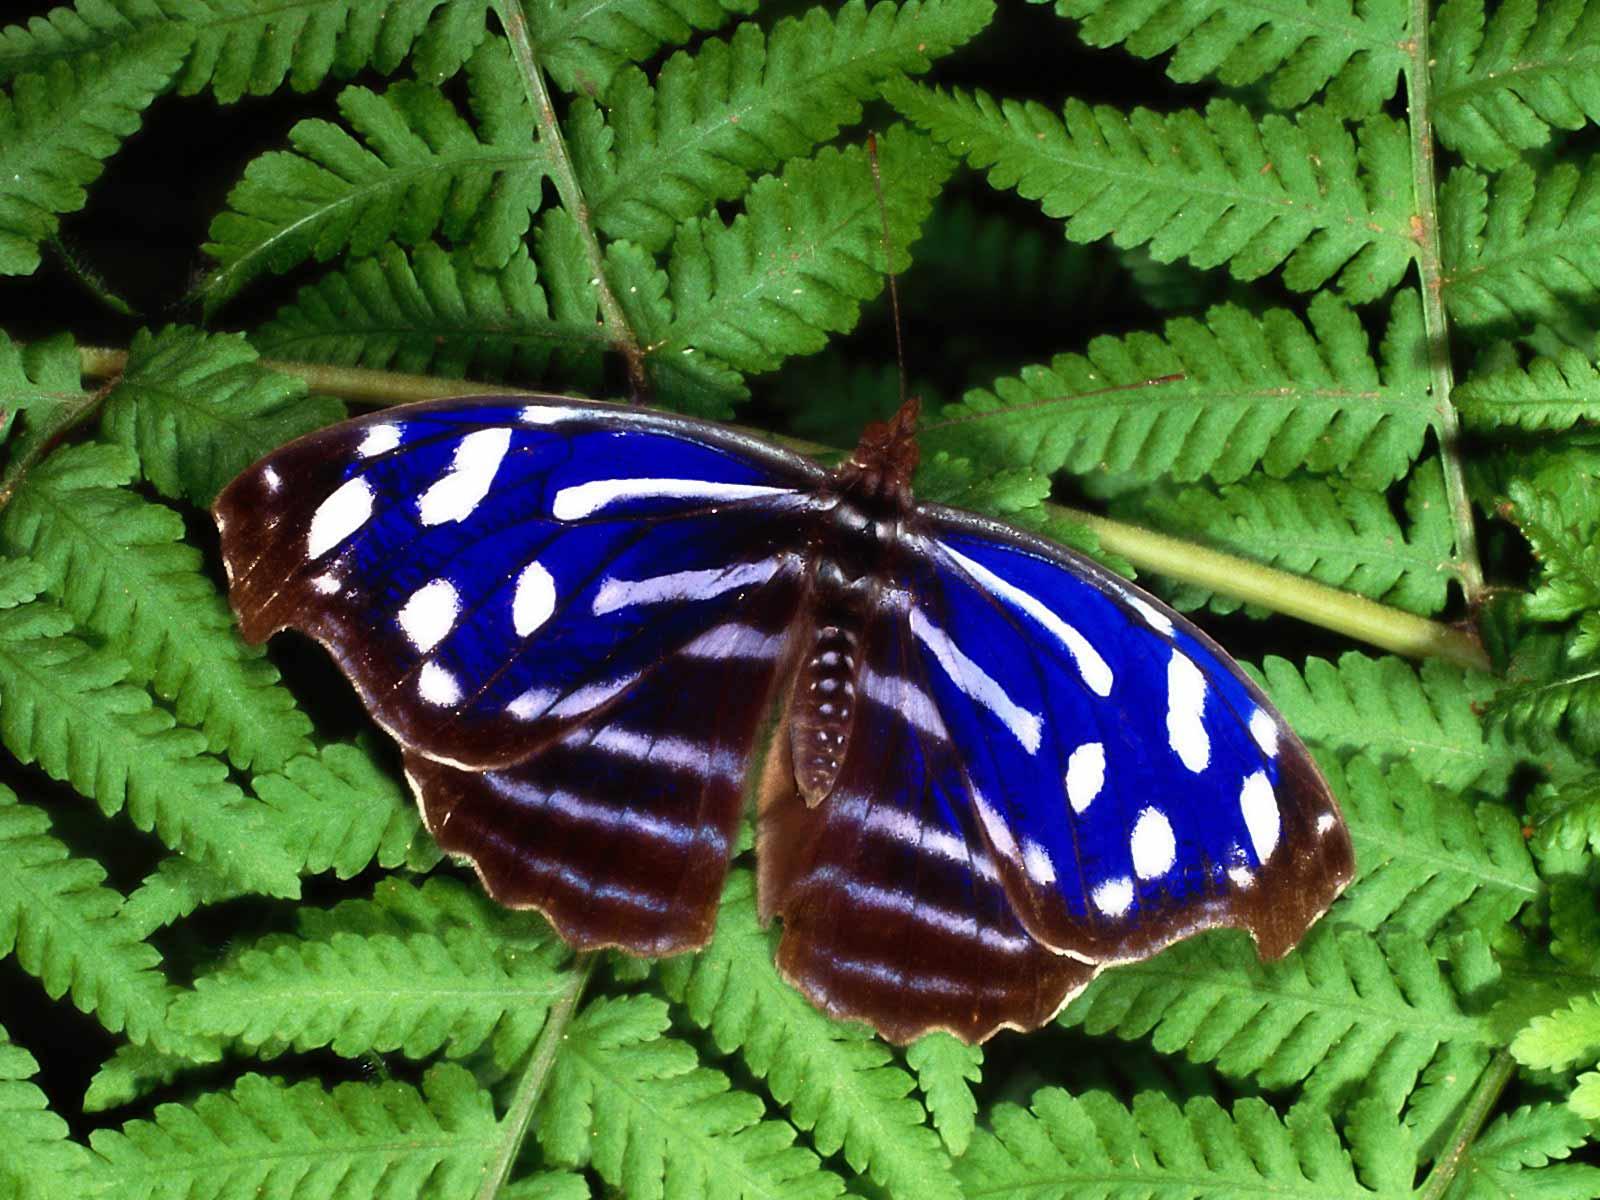 http://1.bp.blogspot.com/-czy_TUNys6U/TzmCV6uhtLI/AAAAAAAAEcg/ewDkMYw3i40/s1600/The-best-top-desktop-butterflies-wallpaper-hd-butterfly-wallpaper-39.jpg